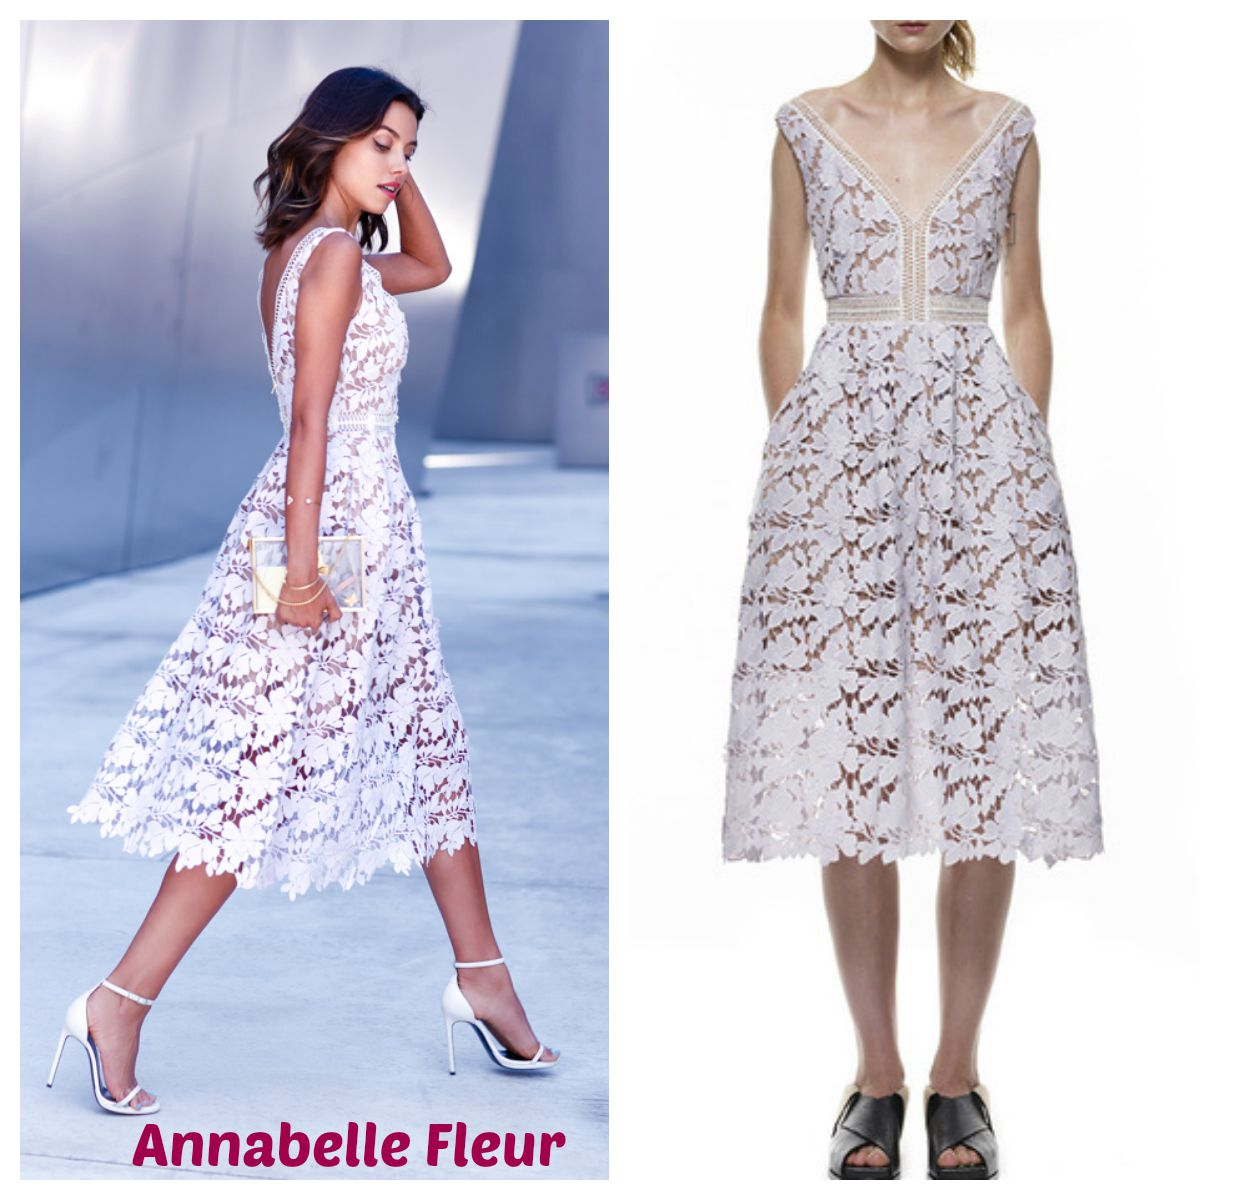 www.shein.com/White-Deep-Plunge-Neck-Hollow-Dress-p-219519-cat-1727.html?aff_id=3846